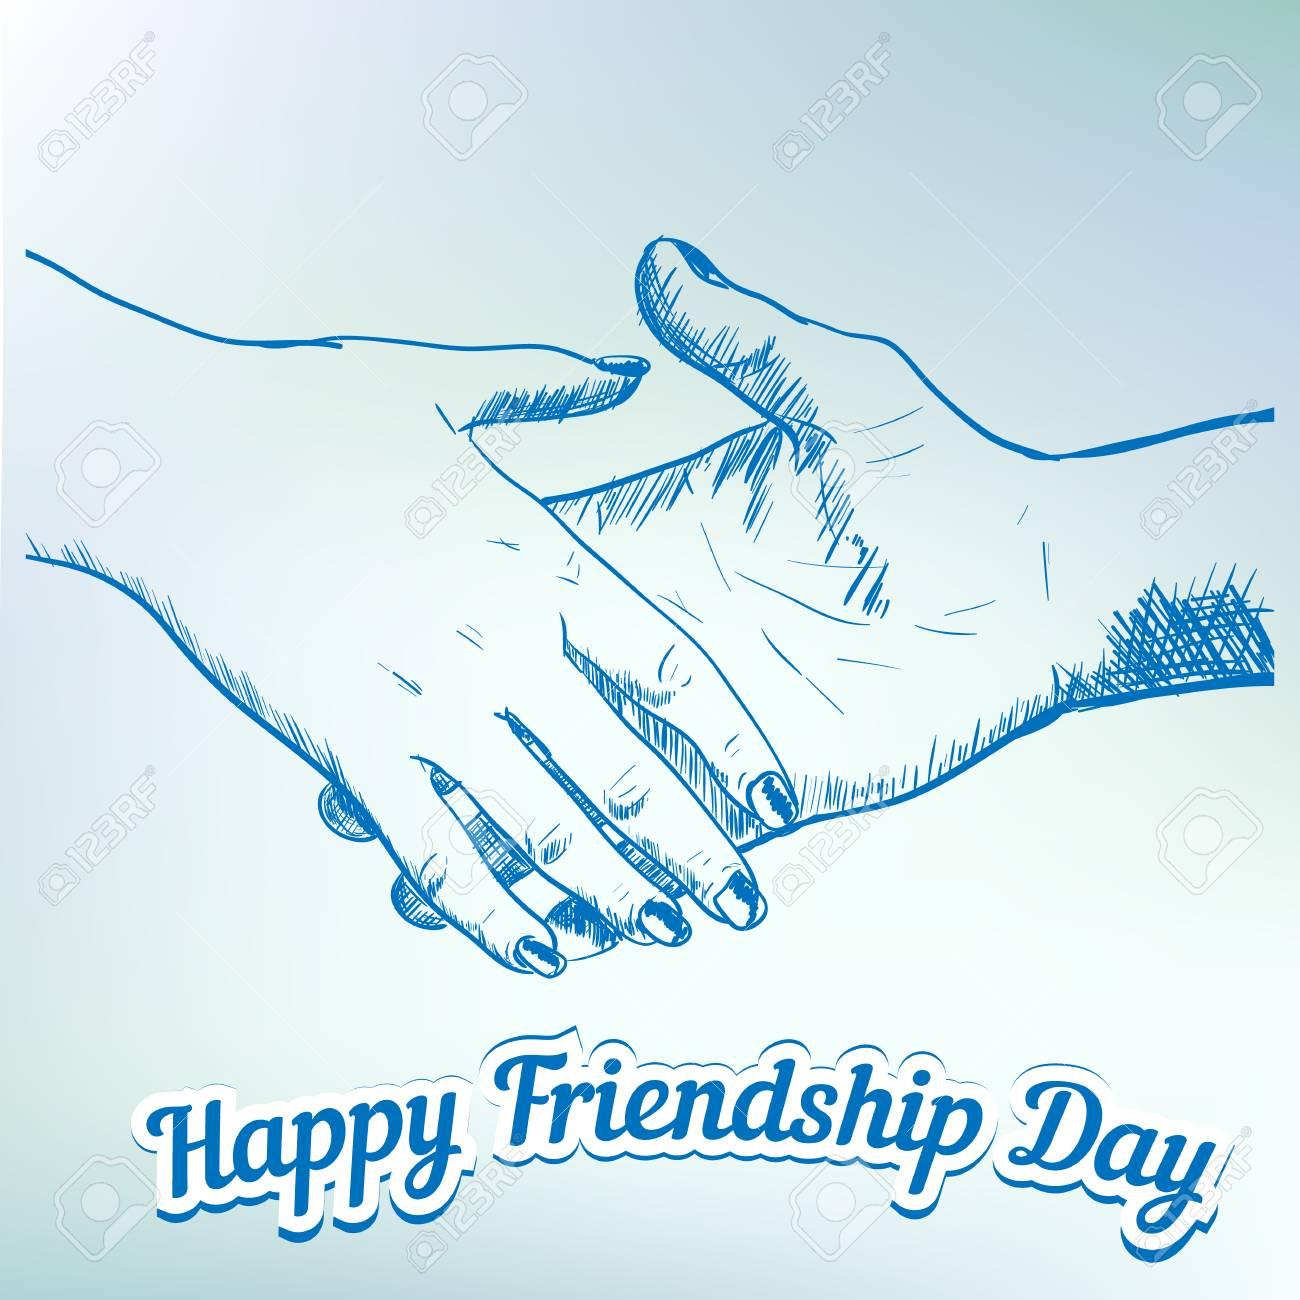 1300x1300 Hands Shaking Sketch Friendship Day Flat Vector Illustration